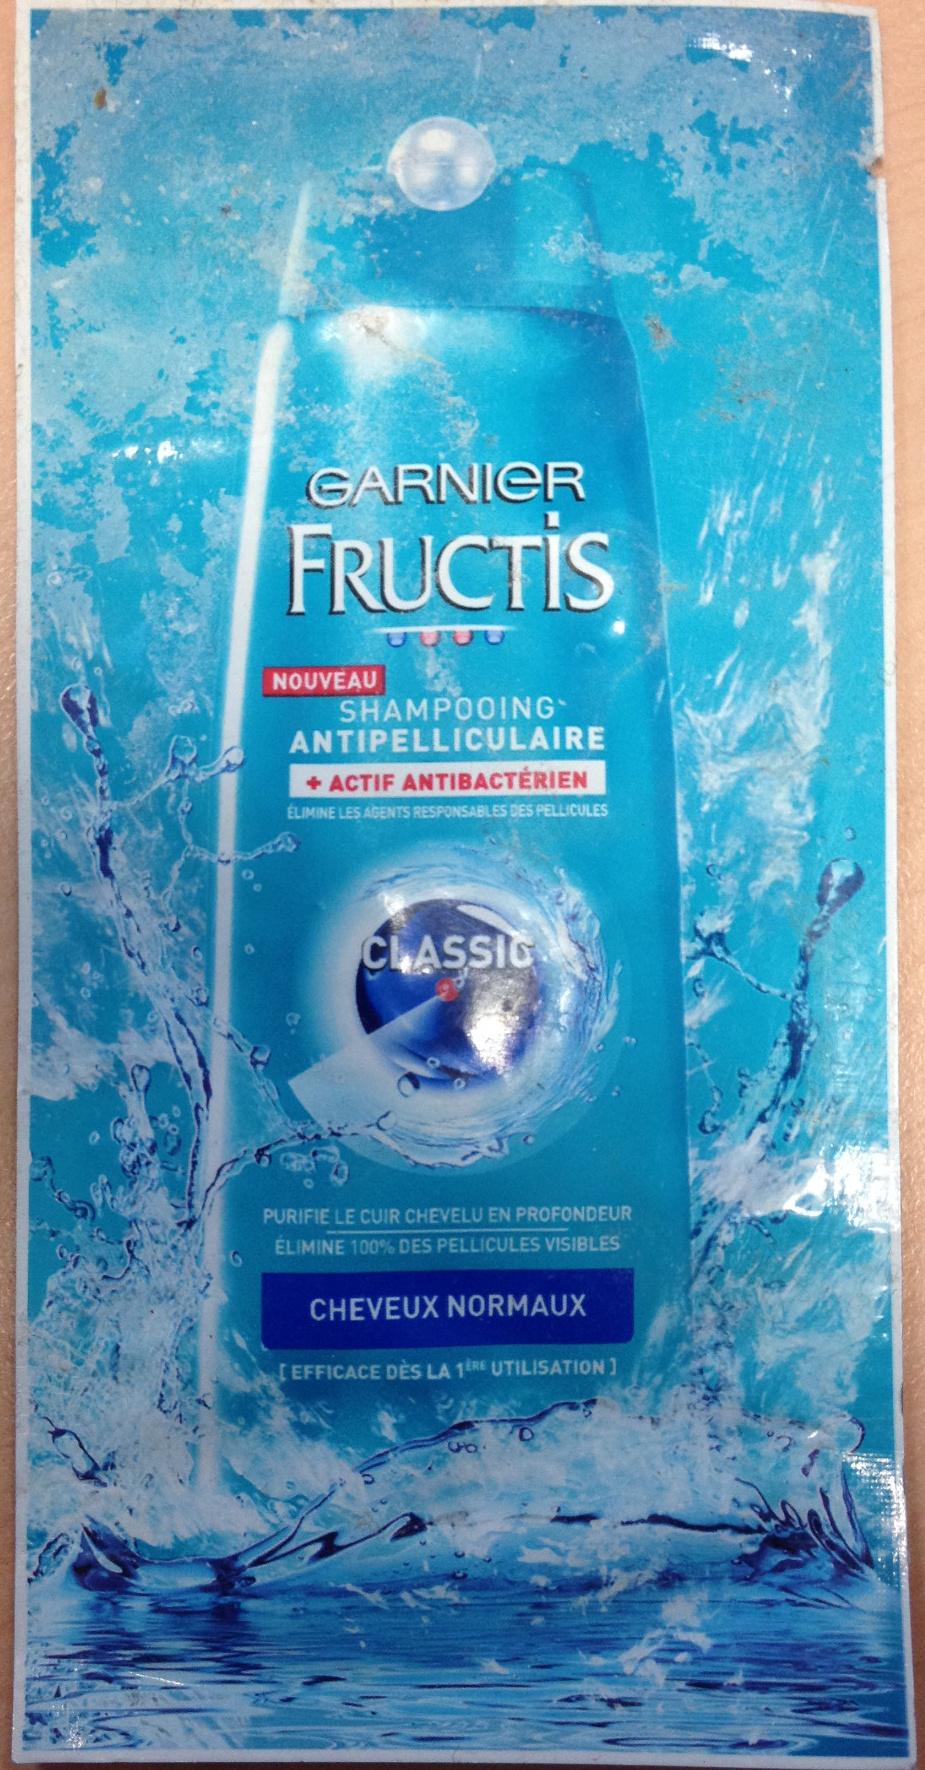 Fructis Classic - Product